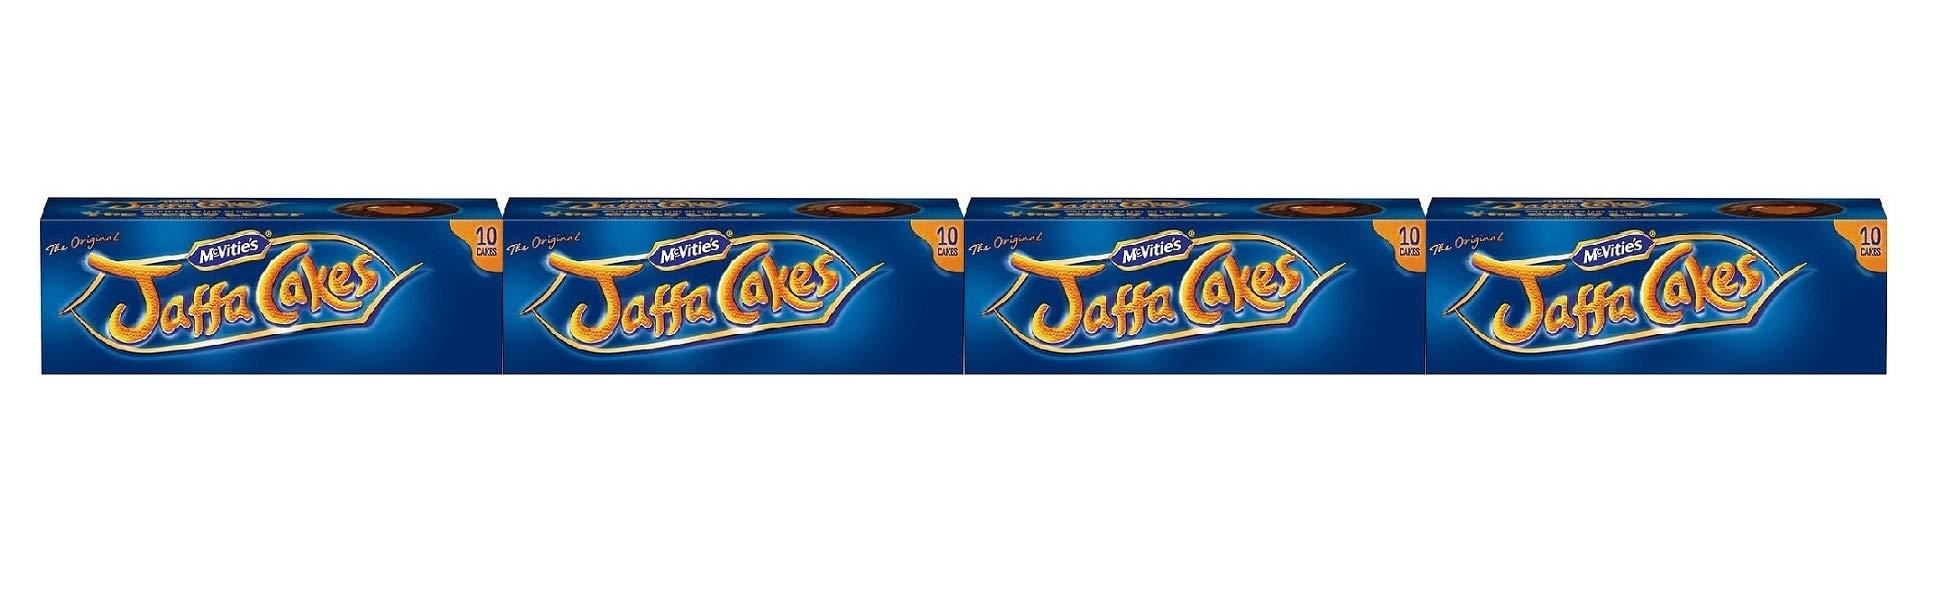 "Jaffa Cakes Massive Xmas Tube ""A Yard of Jaffa"" - x 40 Jaffa Cakes"